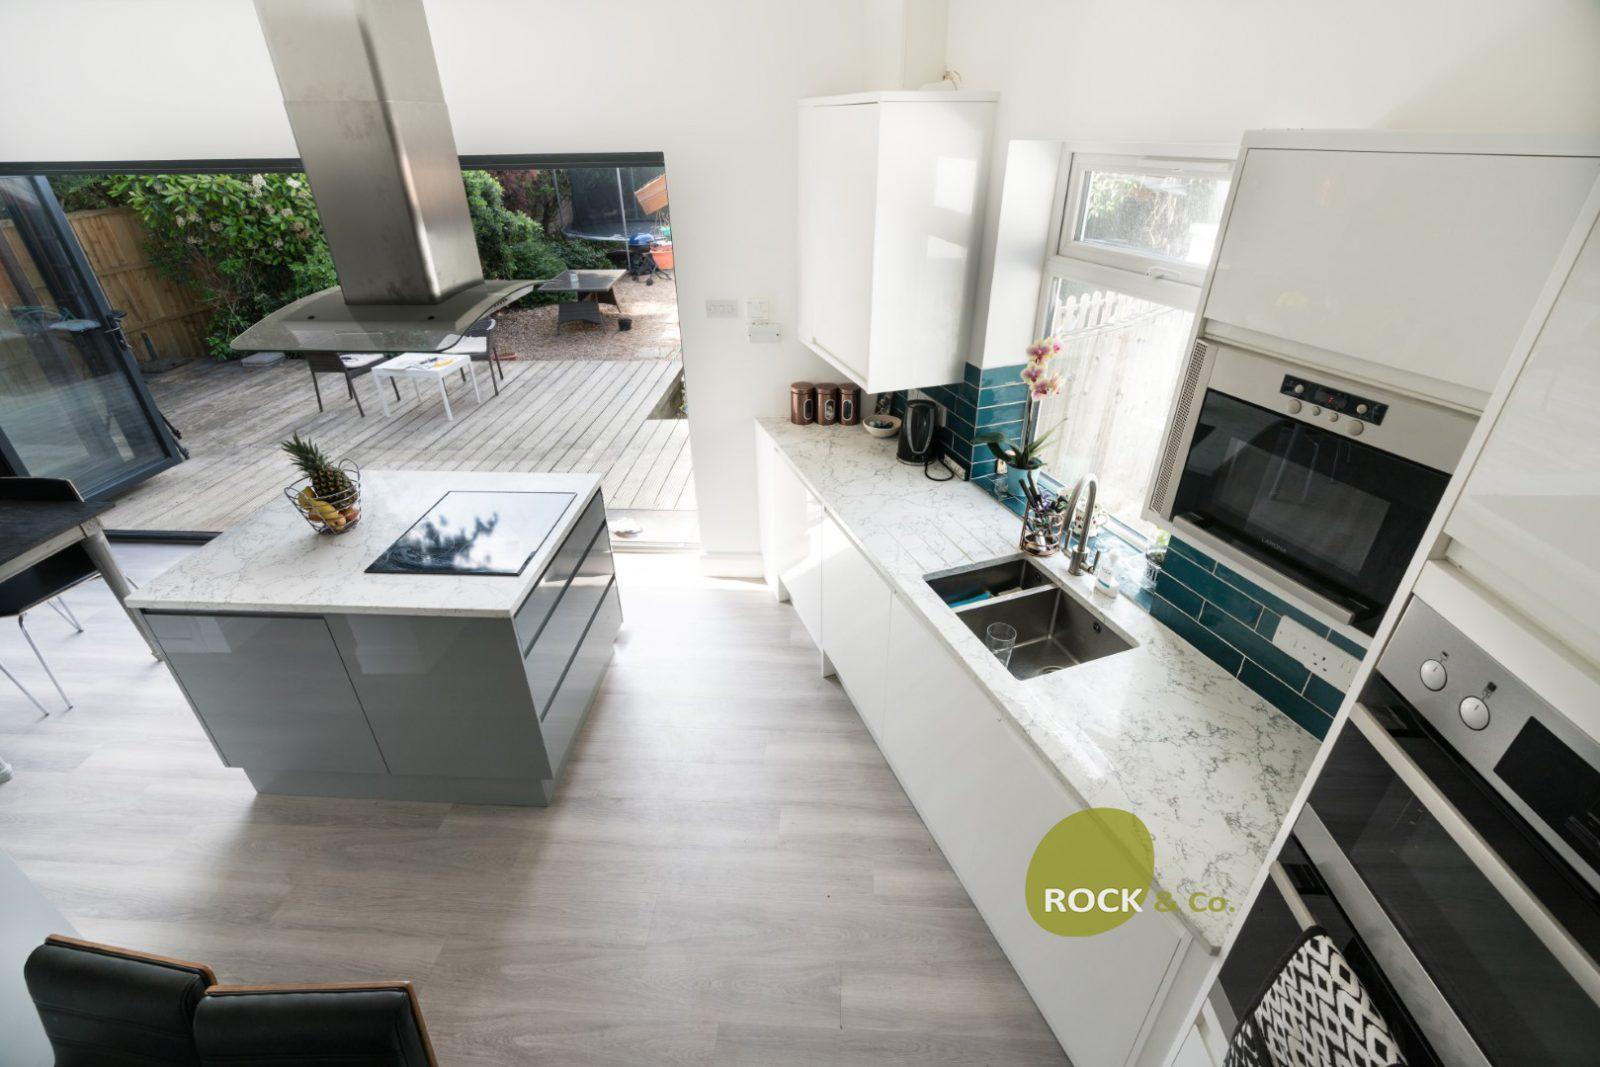 Kitchen of the week… Located in Twickenham, showcasing the Montblanc Calacutta